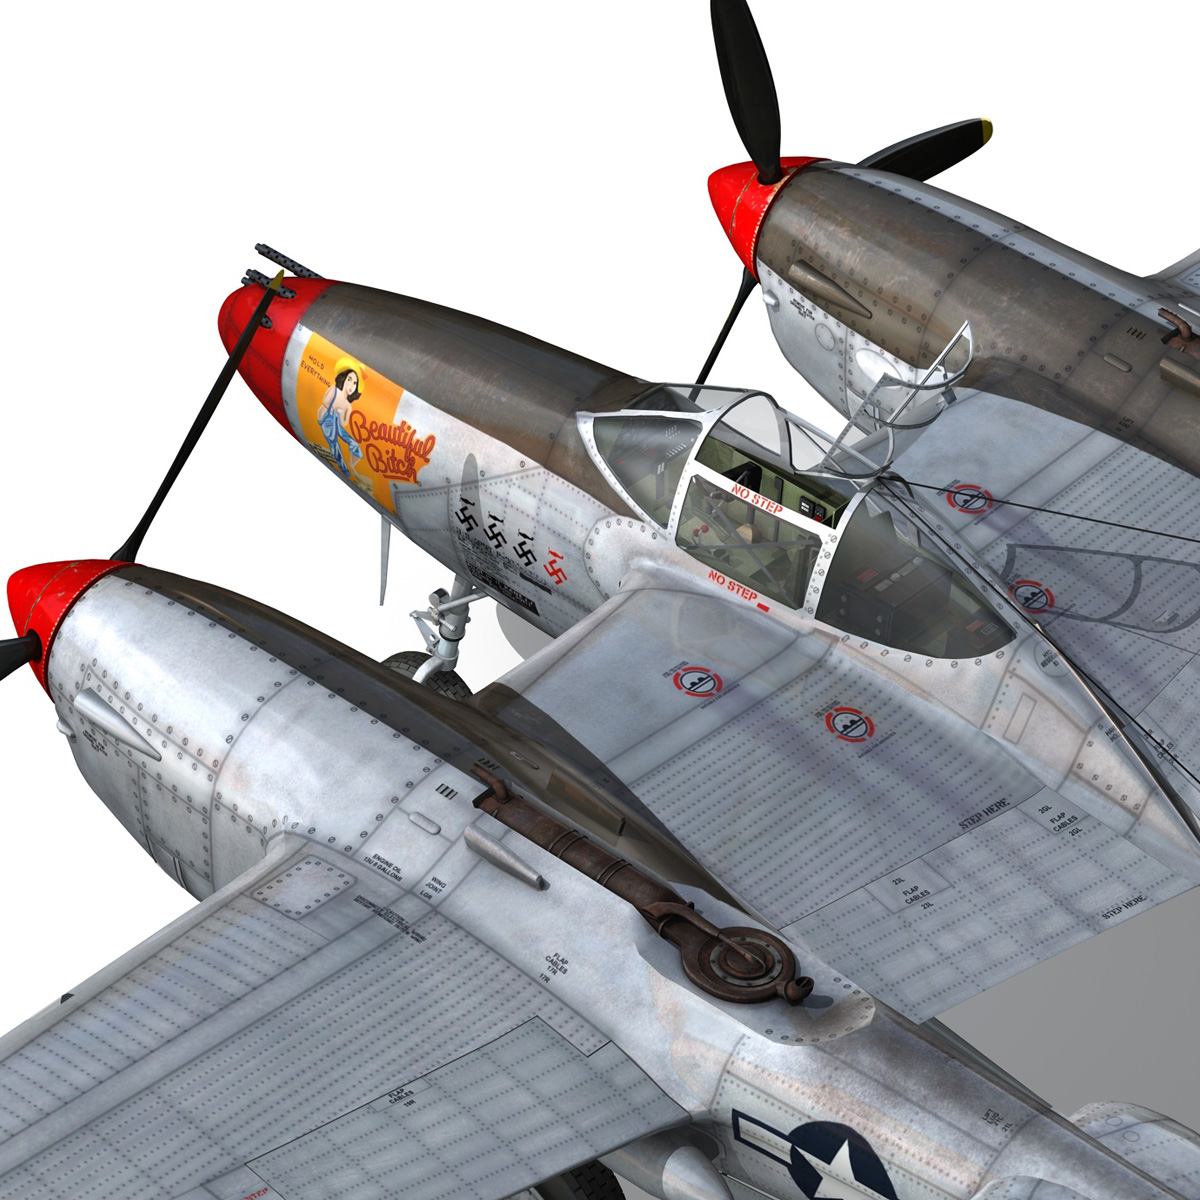 lockheed p-38 lightning – beautiful bitch 3d model fbx c4d lwo obj 272677